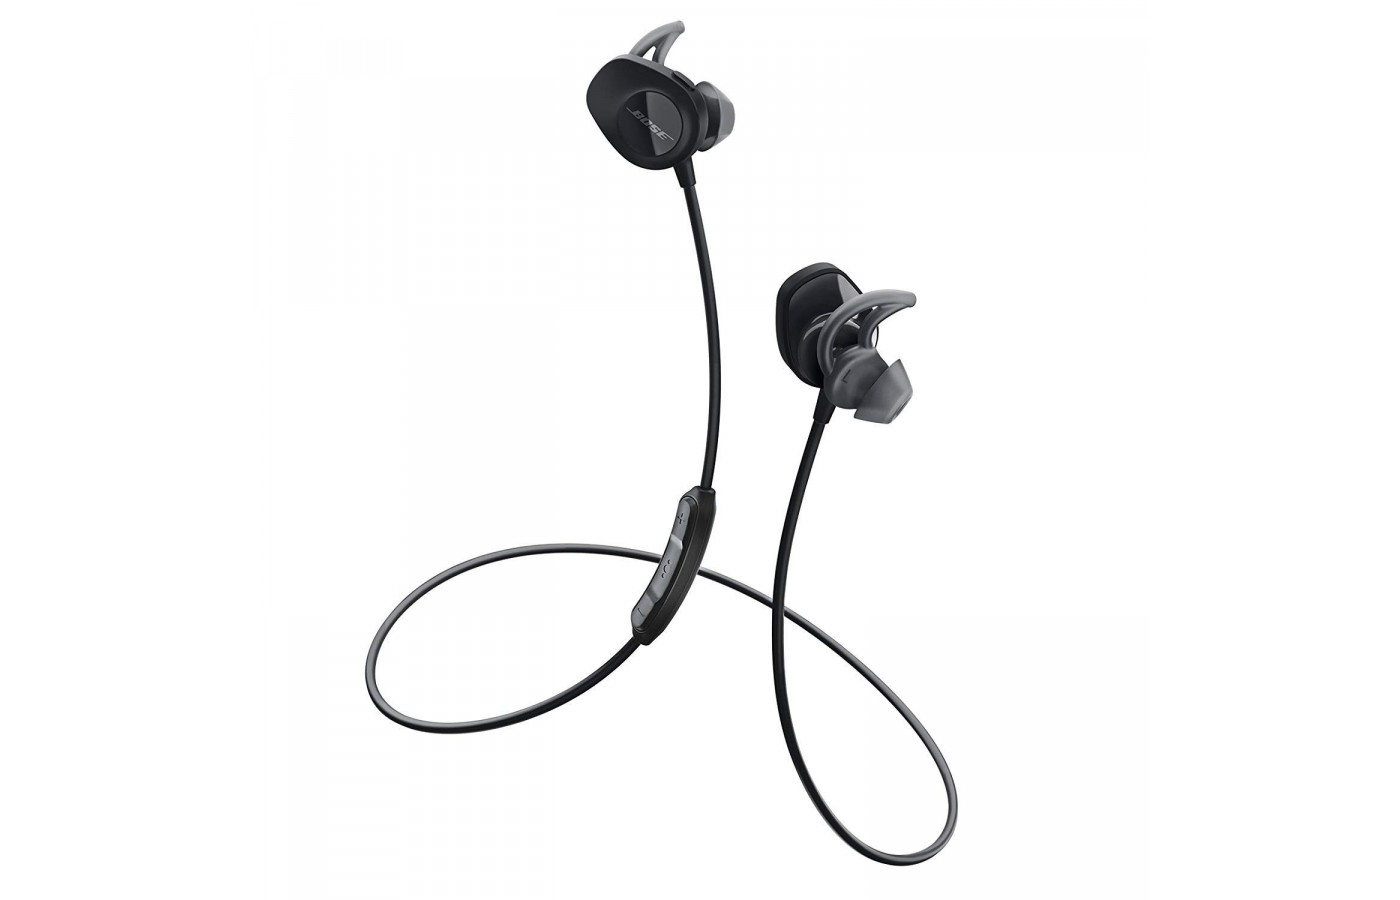 Bose SoundSport features